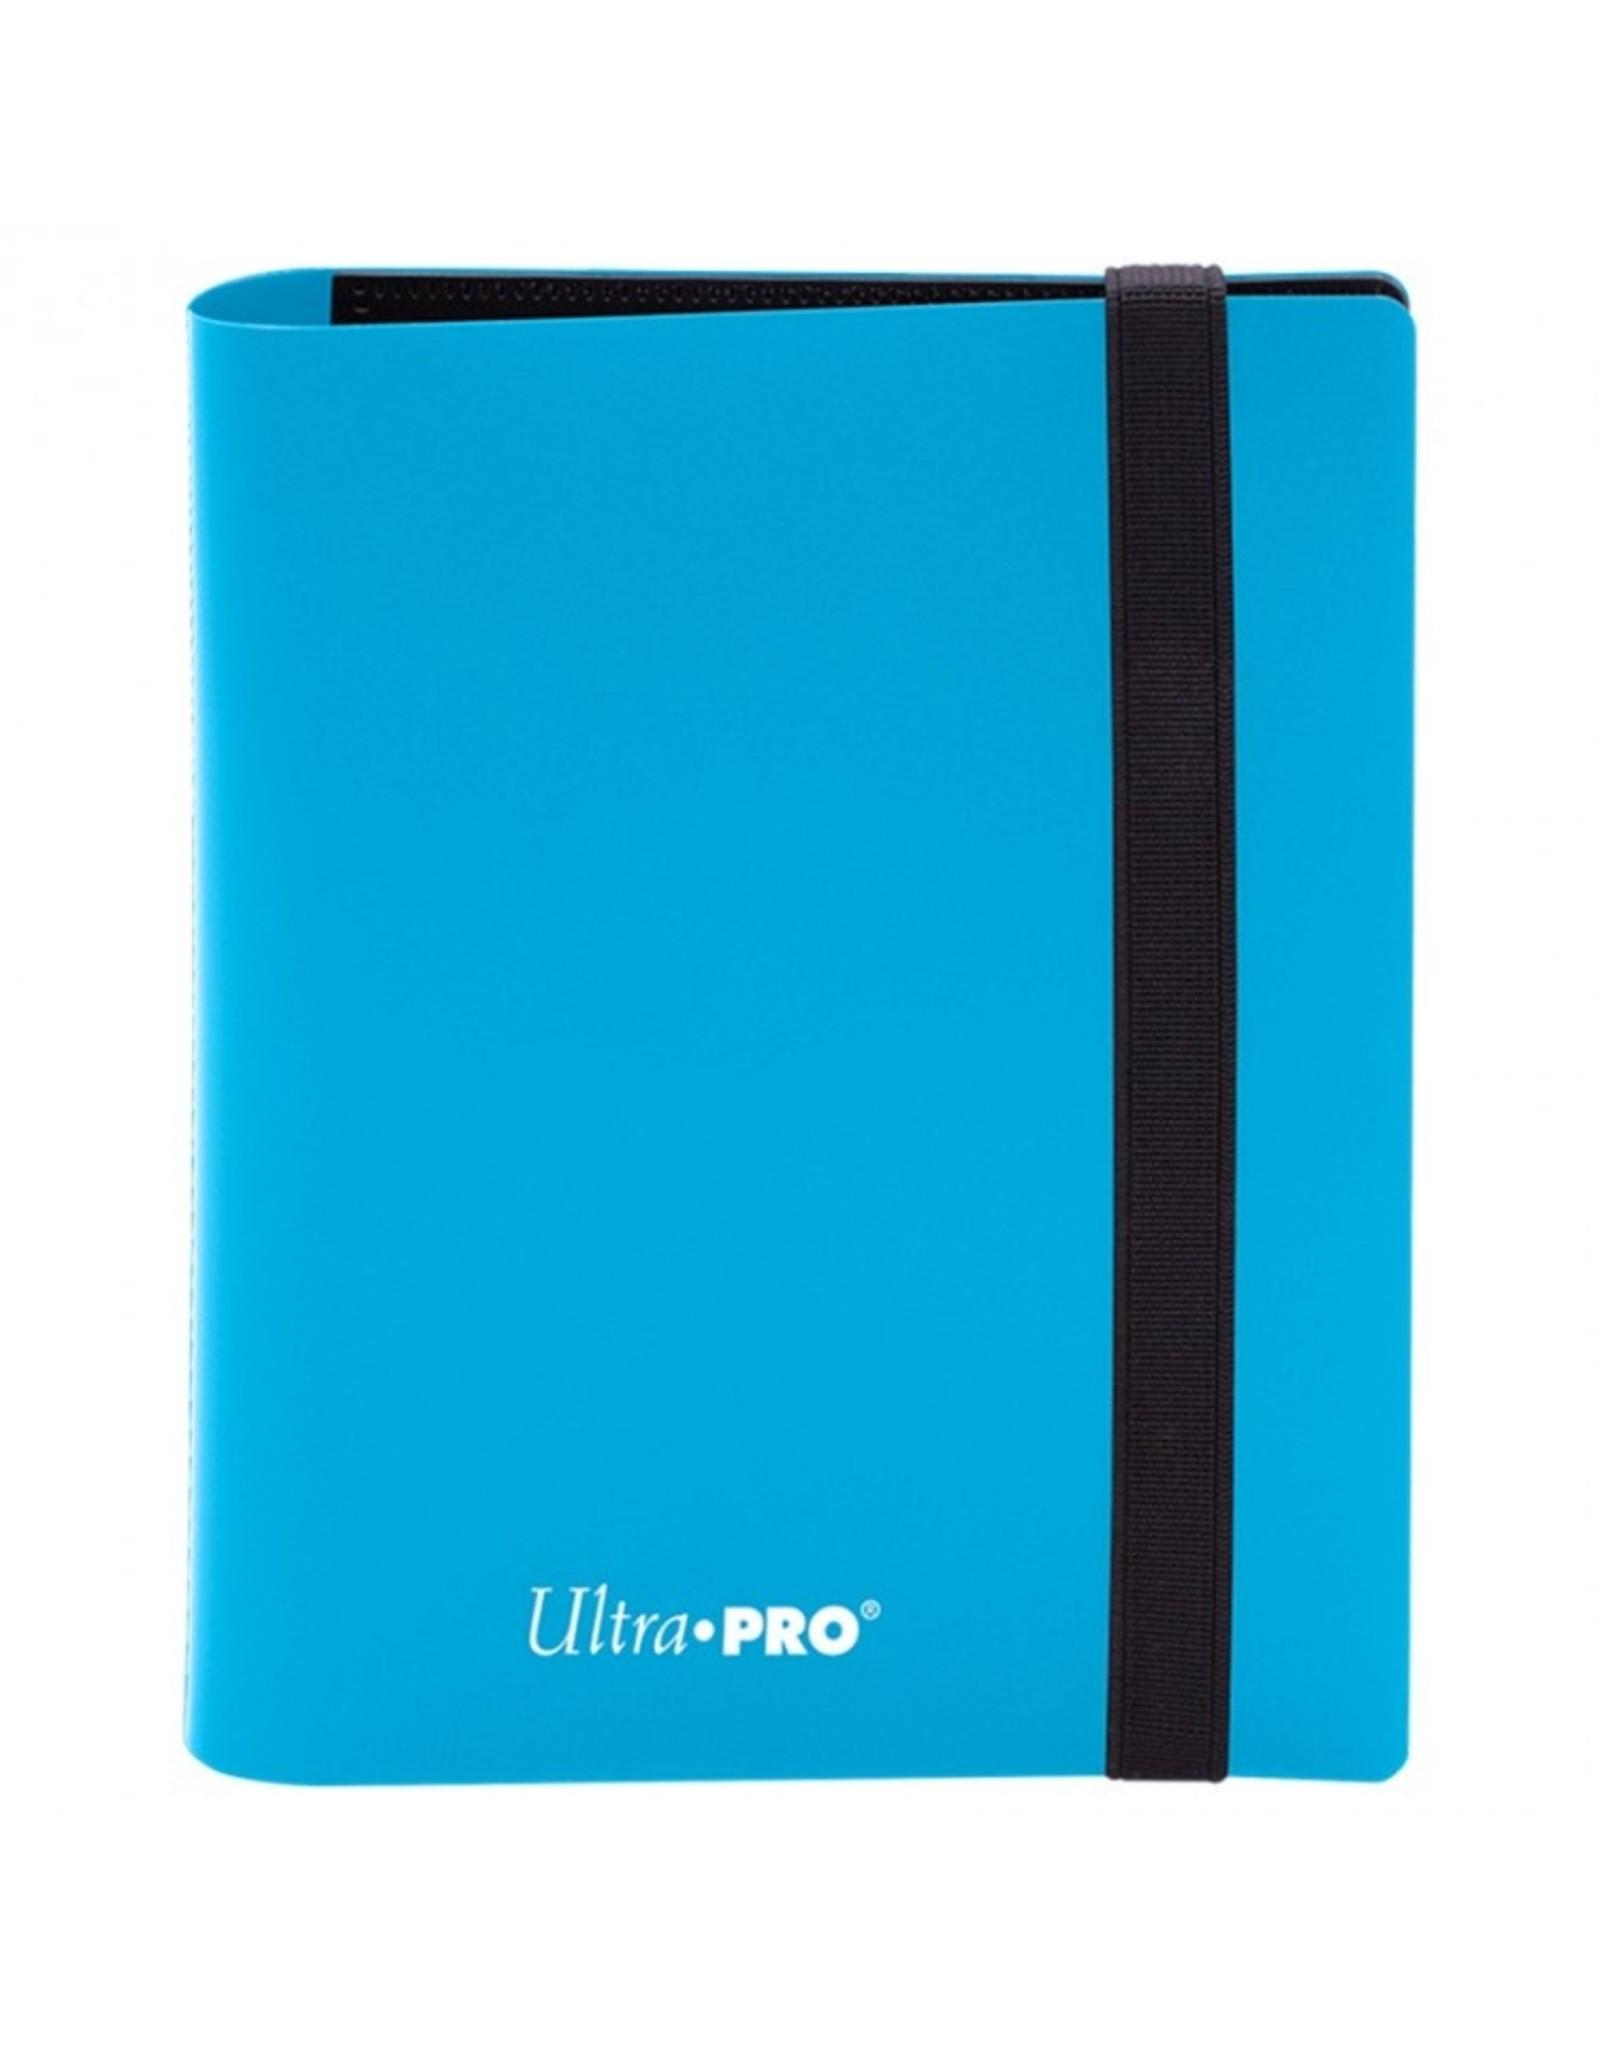 Ultra Pro Binder: 4pkt: PRO: Eclipse: SBU